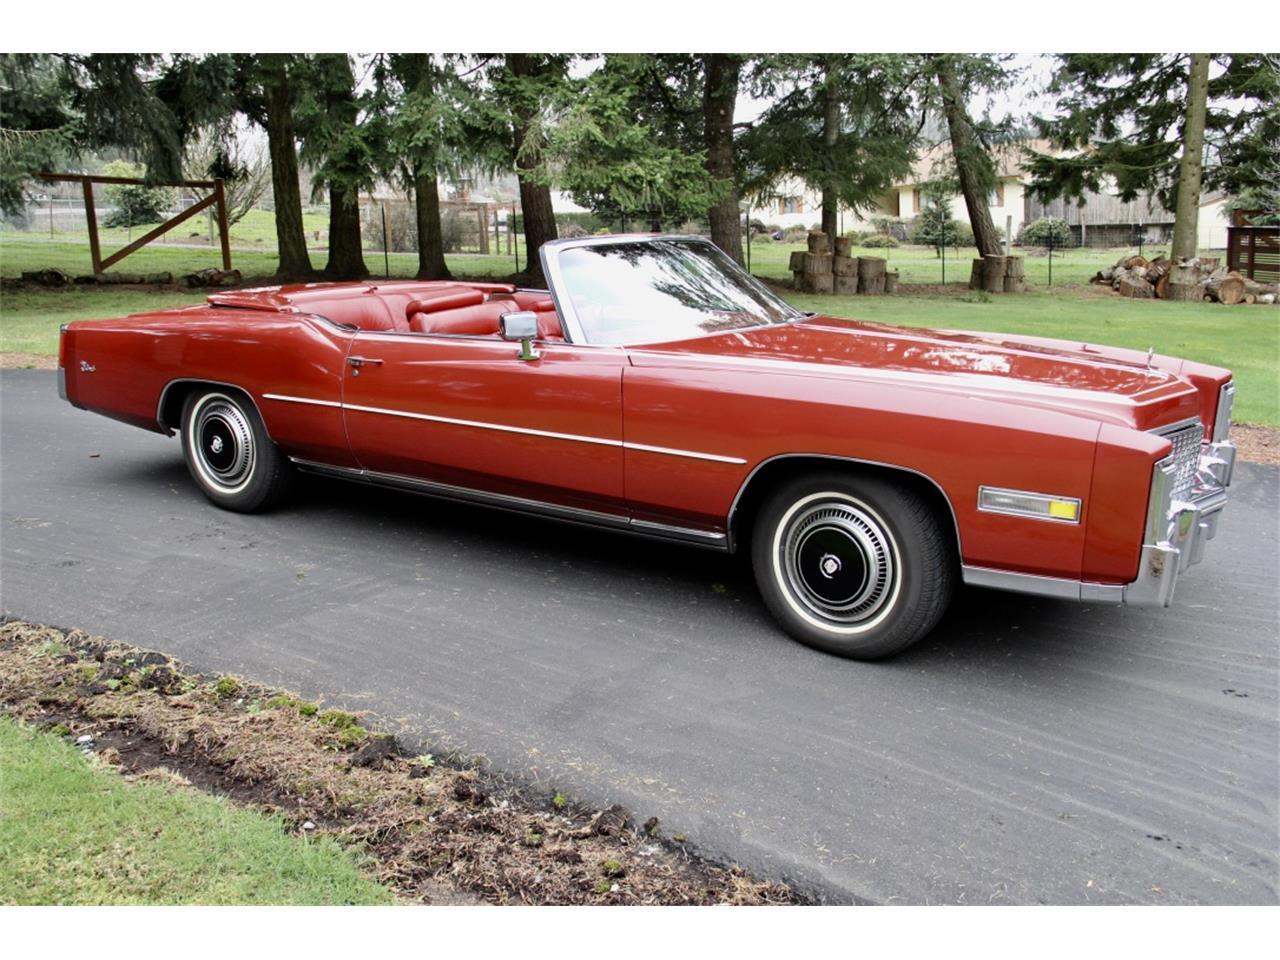 1976 Cadillac Eldorado (CC-1359289) for sale in Lake Oswego, Oregon